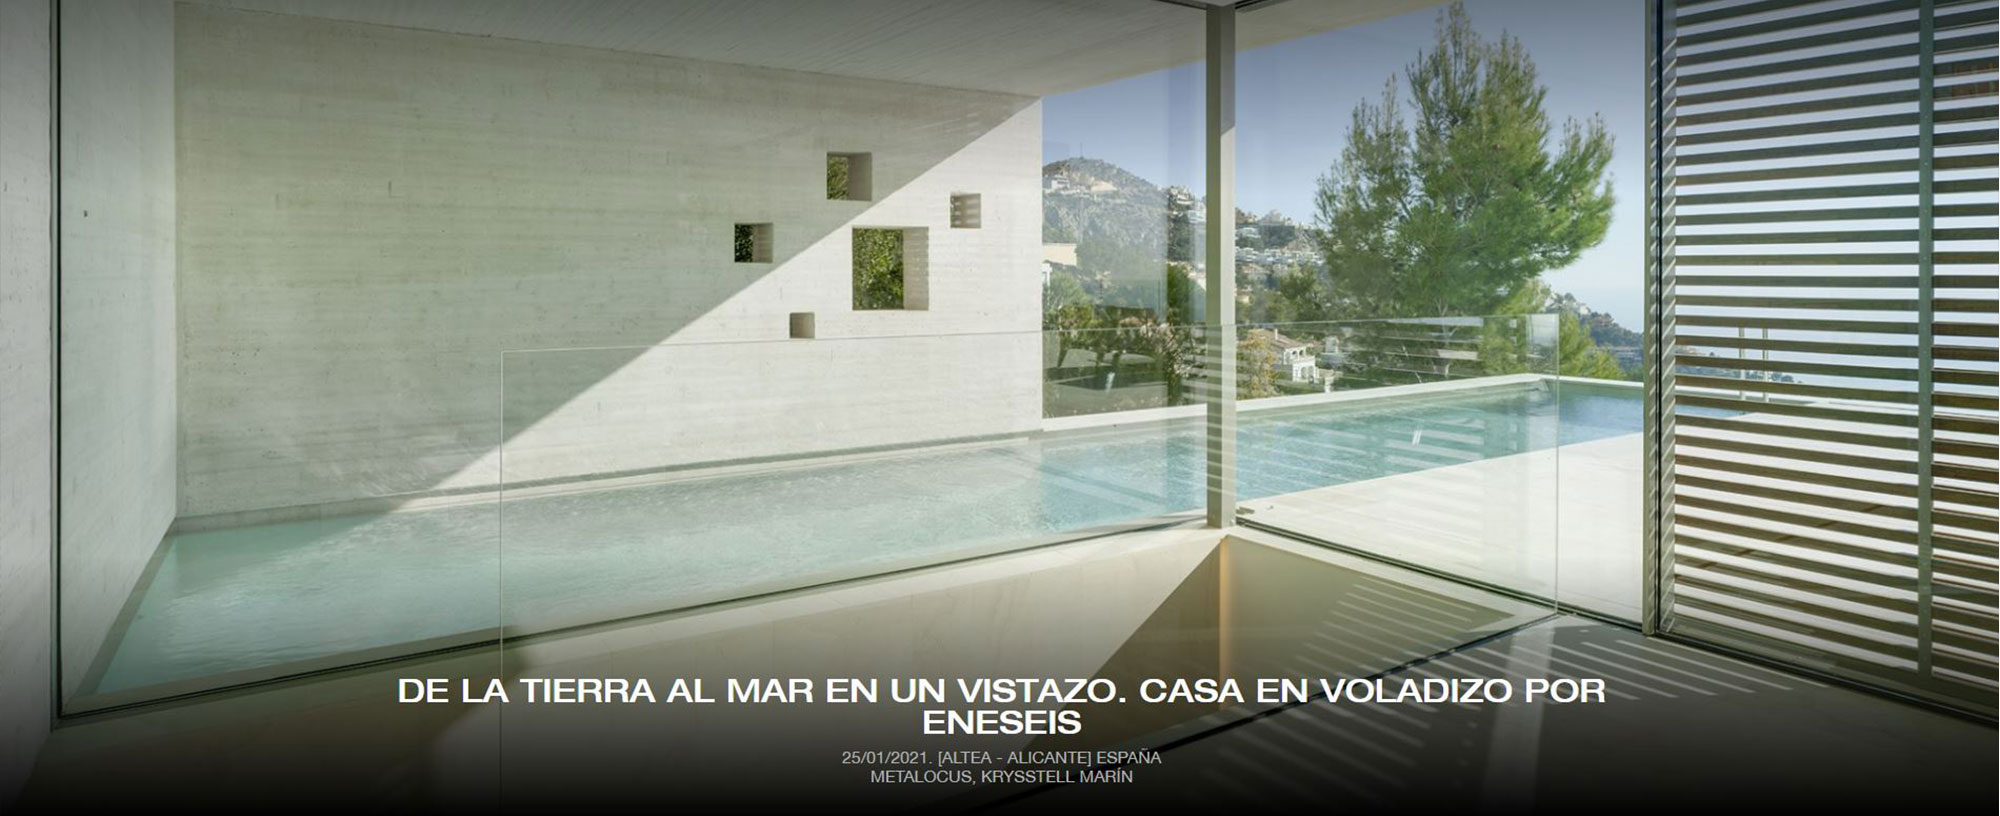 210125_Portada-BLOG_502_METALOCUS-casa-voladizo